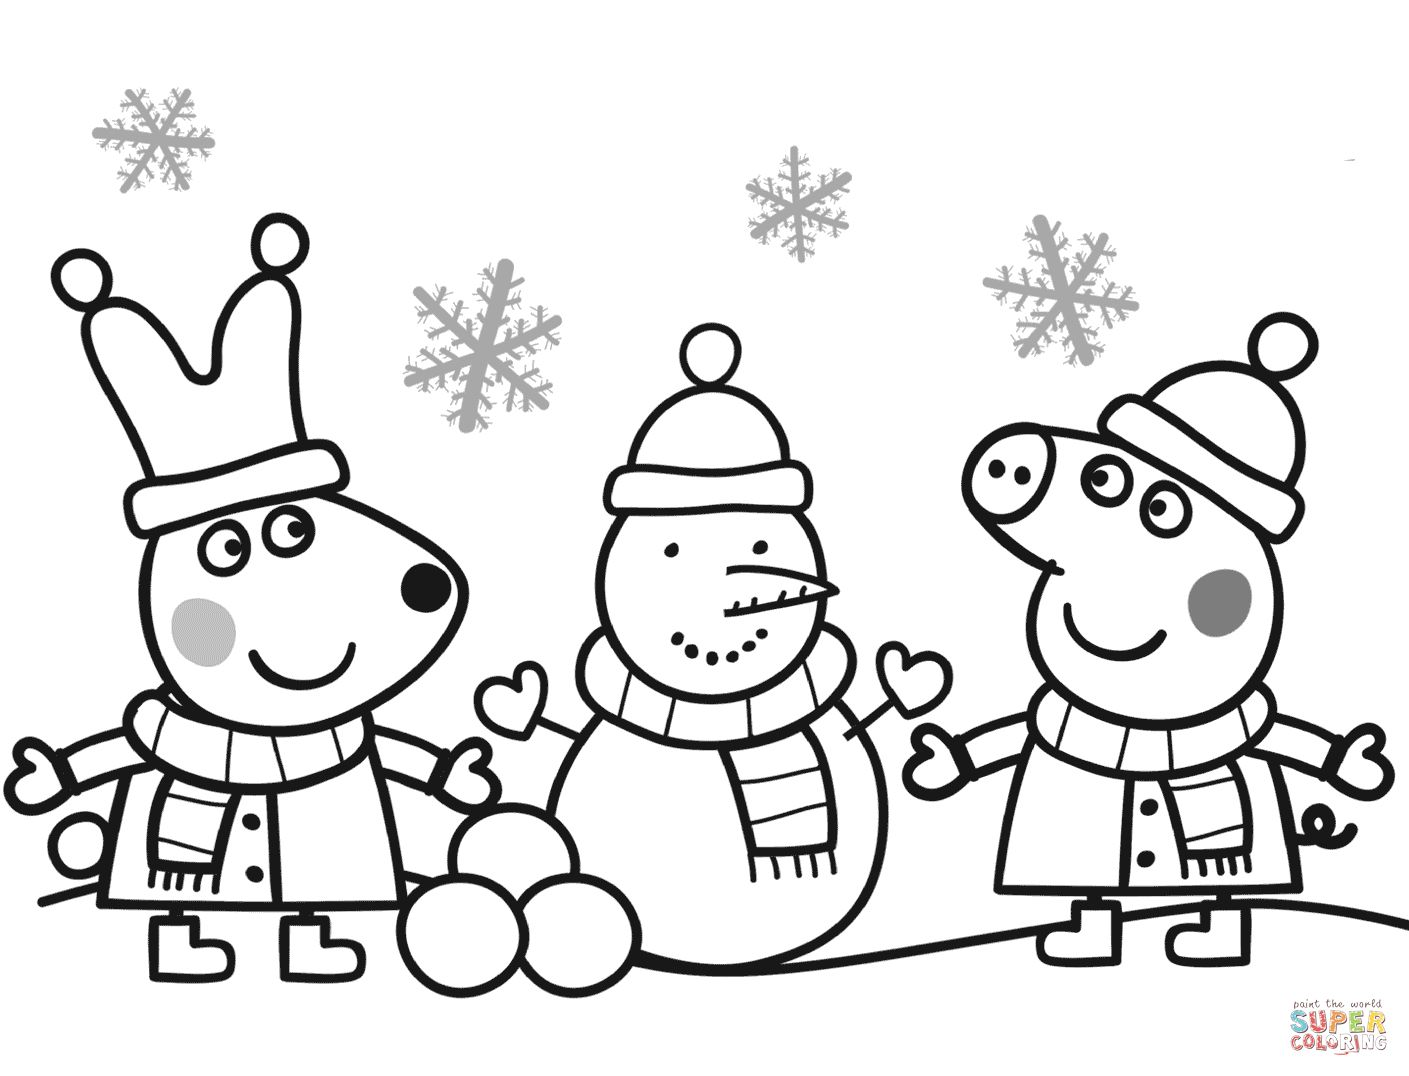 Peppa Pig Printable Coloring Pages Peppa Pig Coloring Pages Free Coloring Pages Albanysinsanity Com Peppa Pig Coloring Pages Peppa Pig Colouring Peppa Pig Christmas